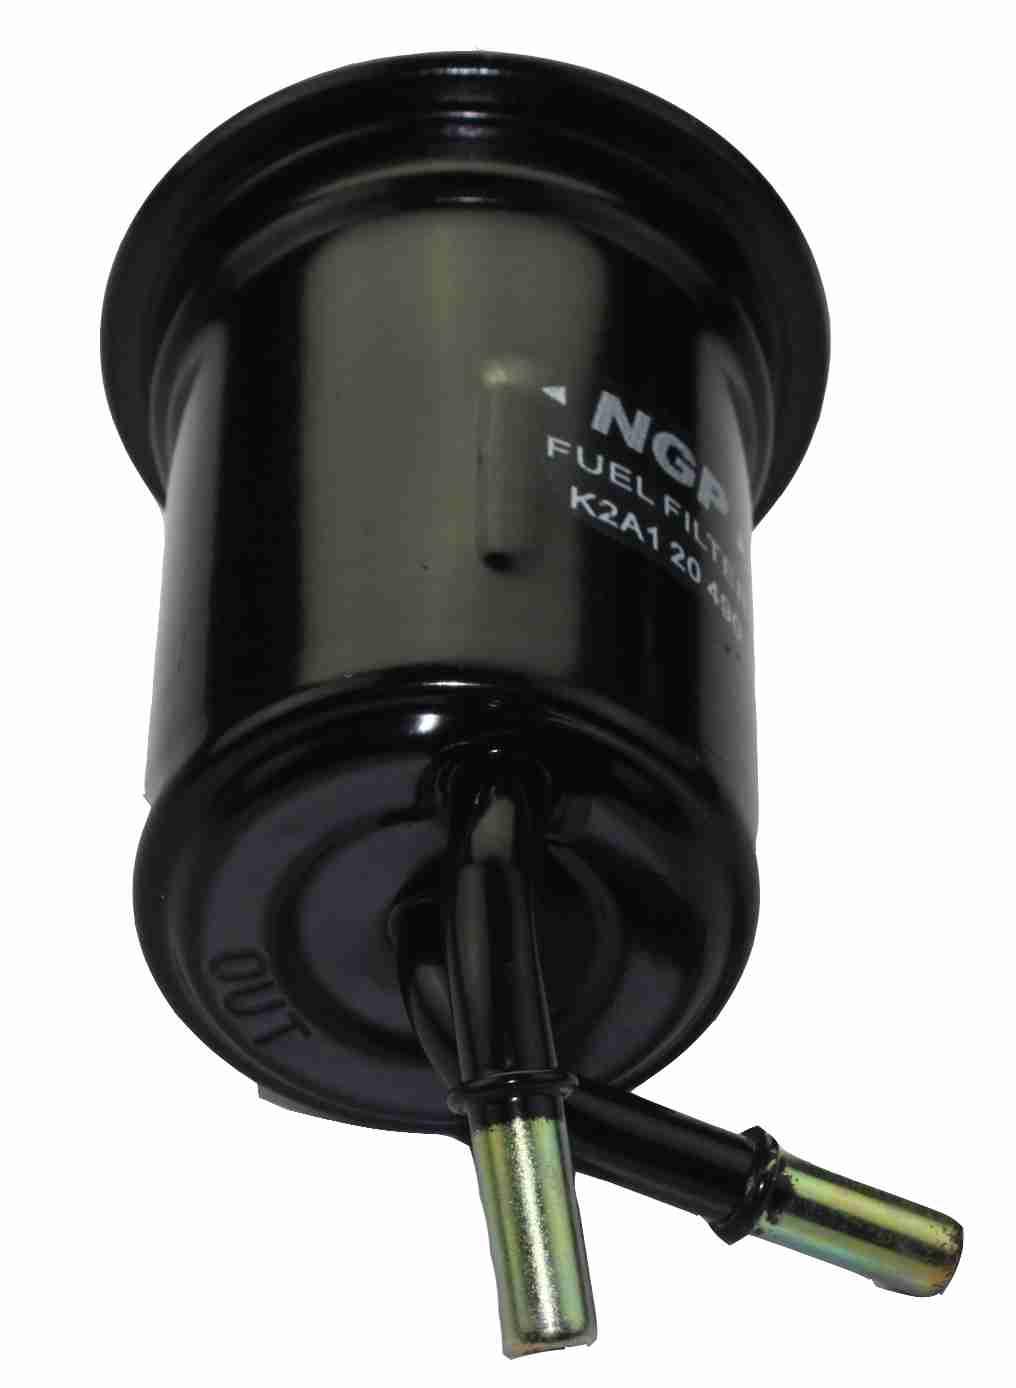 FFT11492(W/O BRACKET)                                 - SEPHIA 1.8 98-99 W/O BRACKET                                 - Fuel Filter                                 ....100592